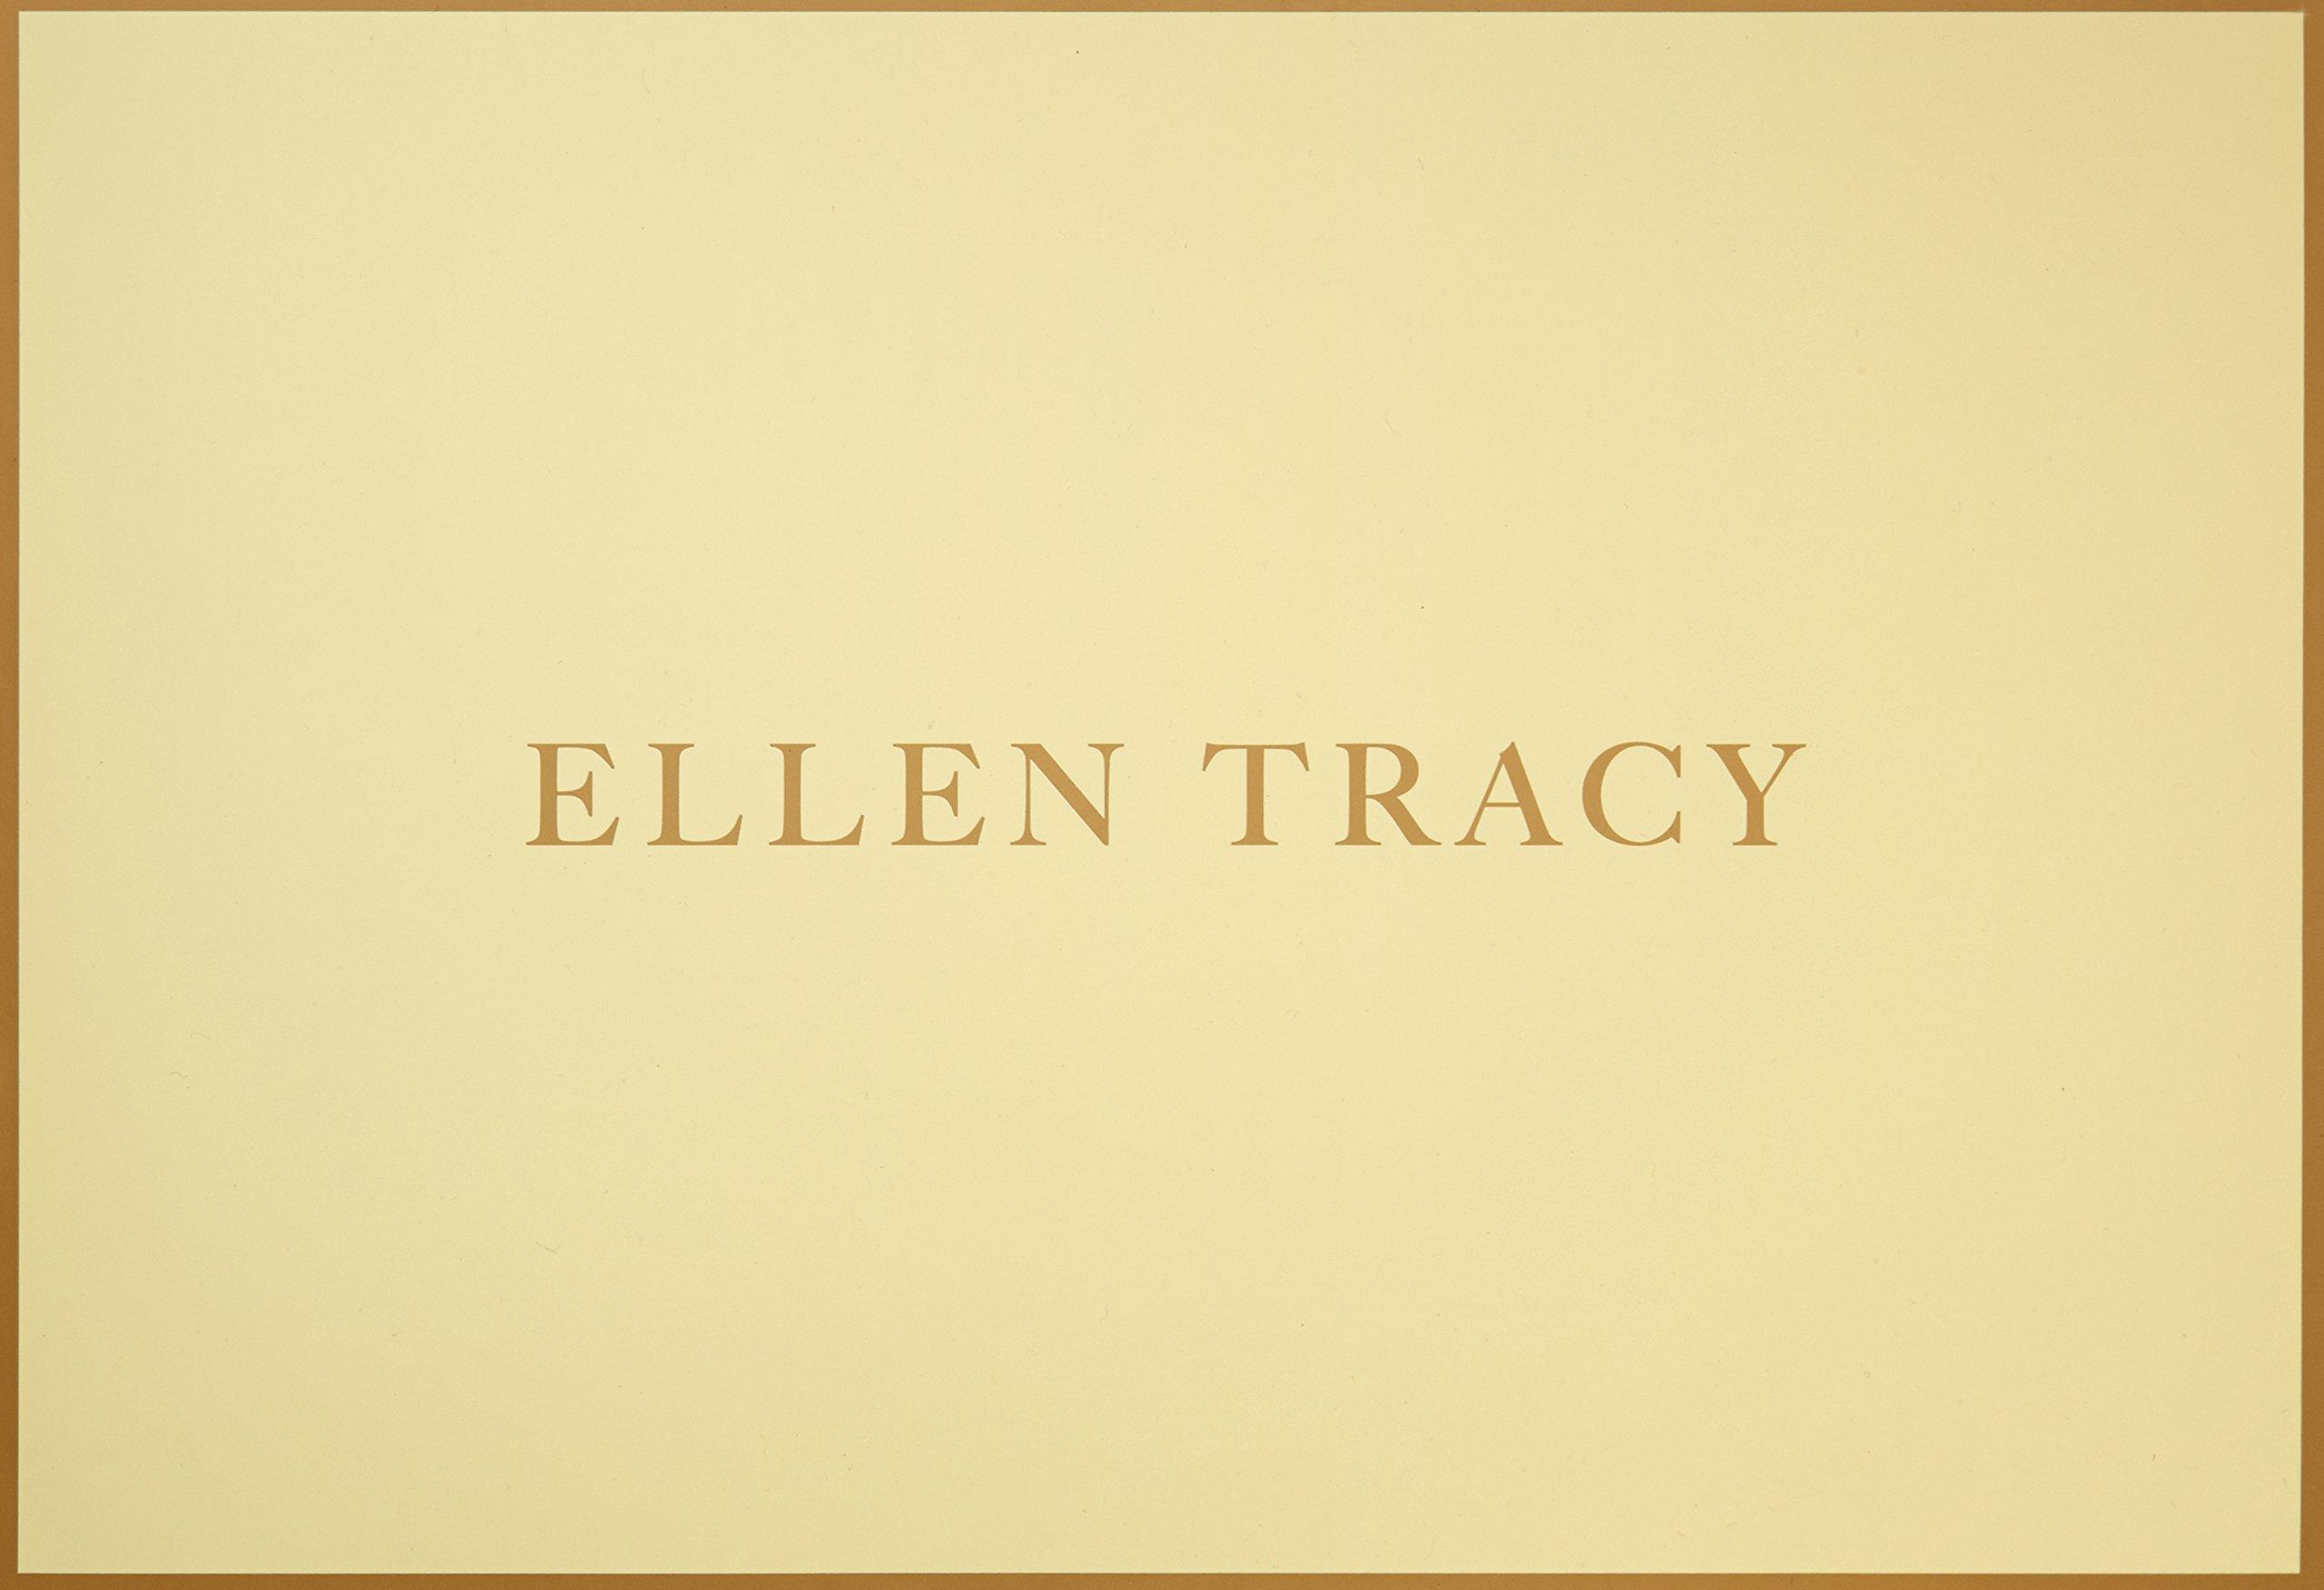 Ellen Tracy Gift Set Perfume for Women, 3 Count by Ellen Tracy (Image #3)